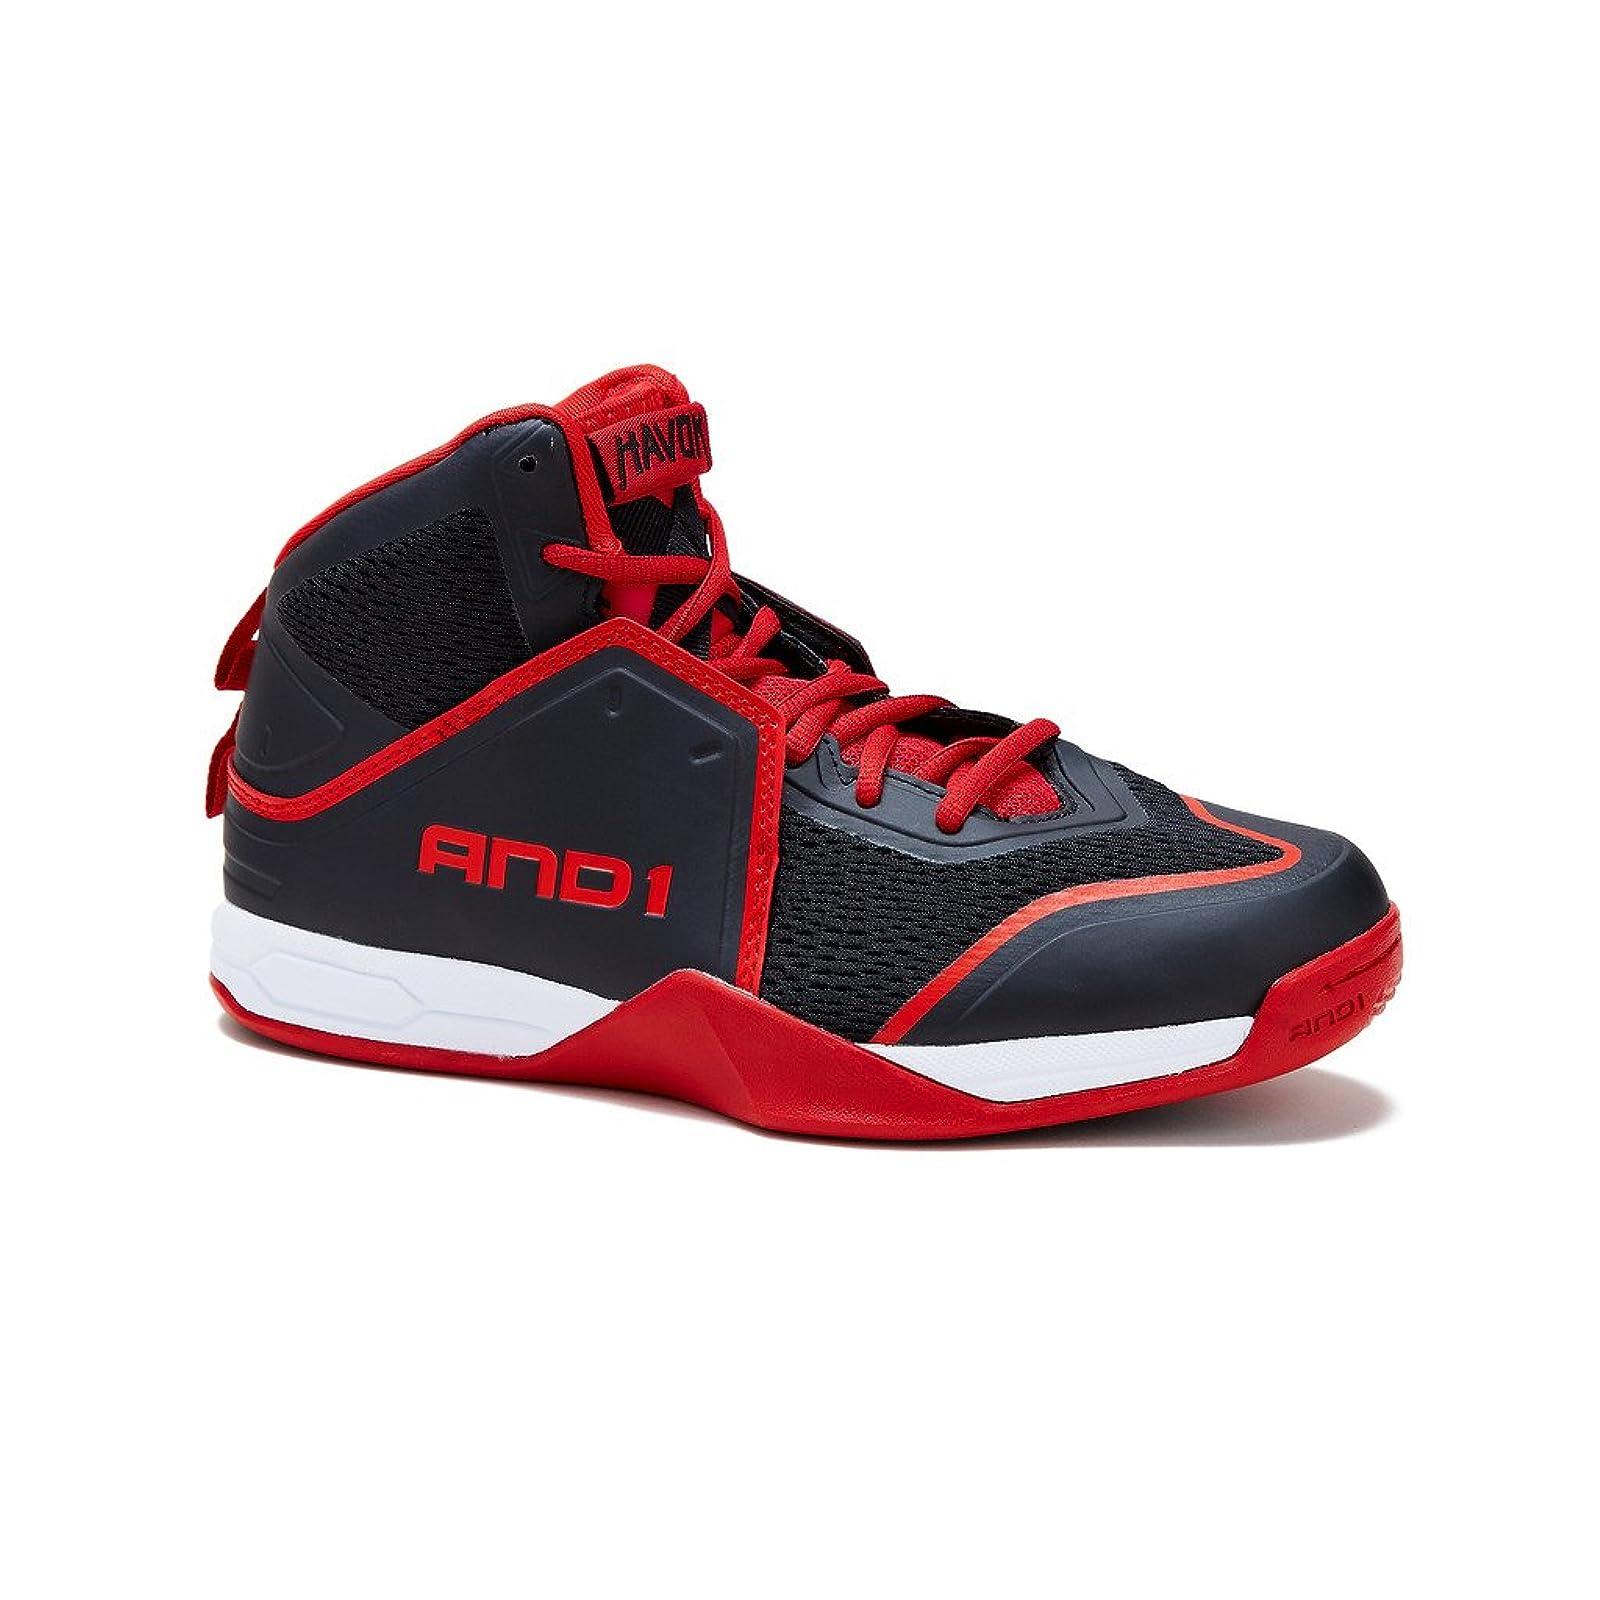 AND1 Men's Havok-M Basketball Shoe Blue - 6